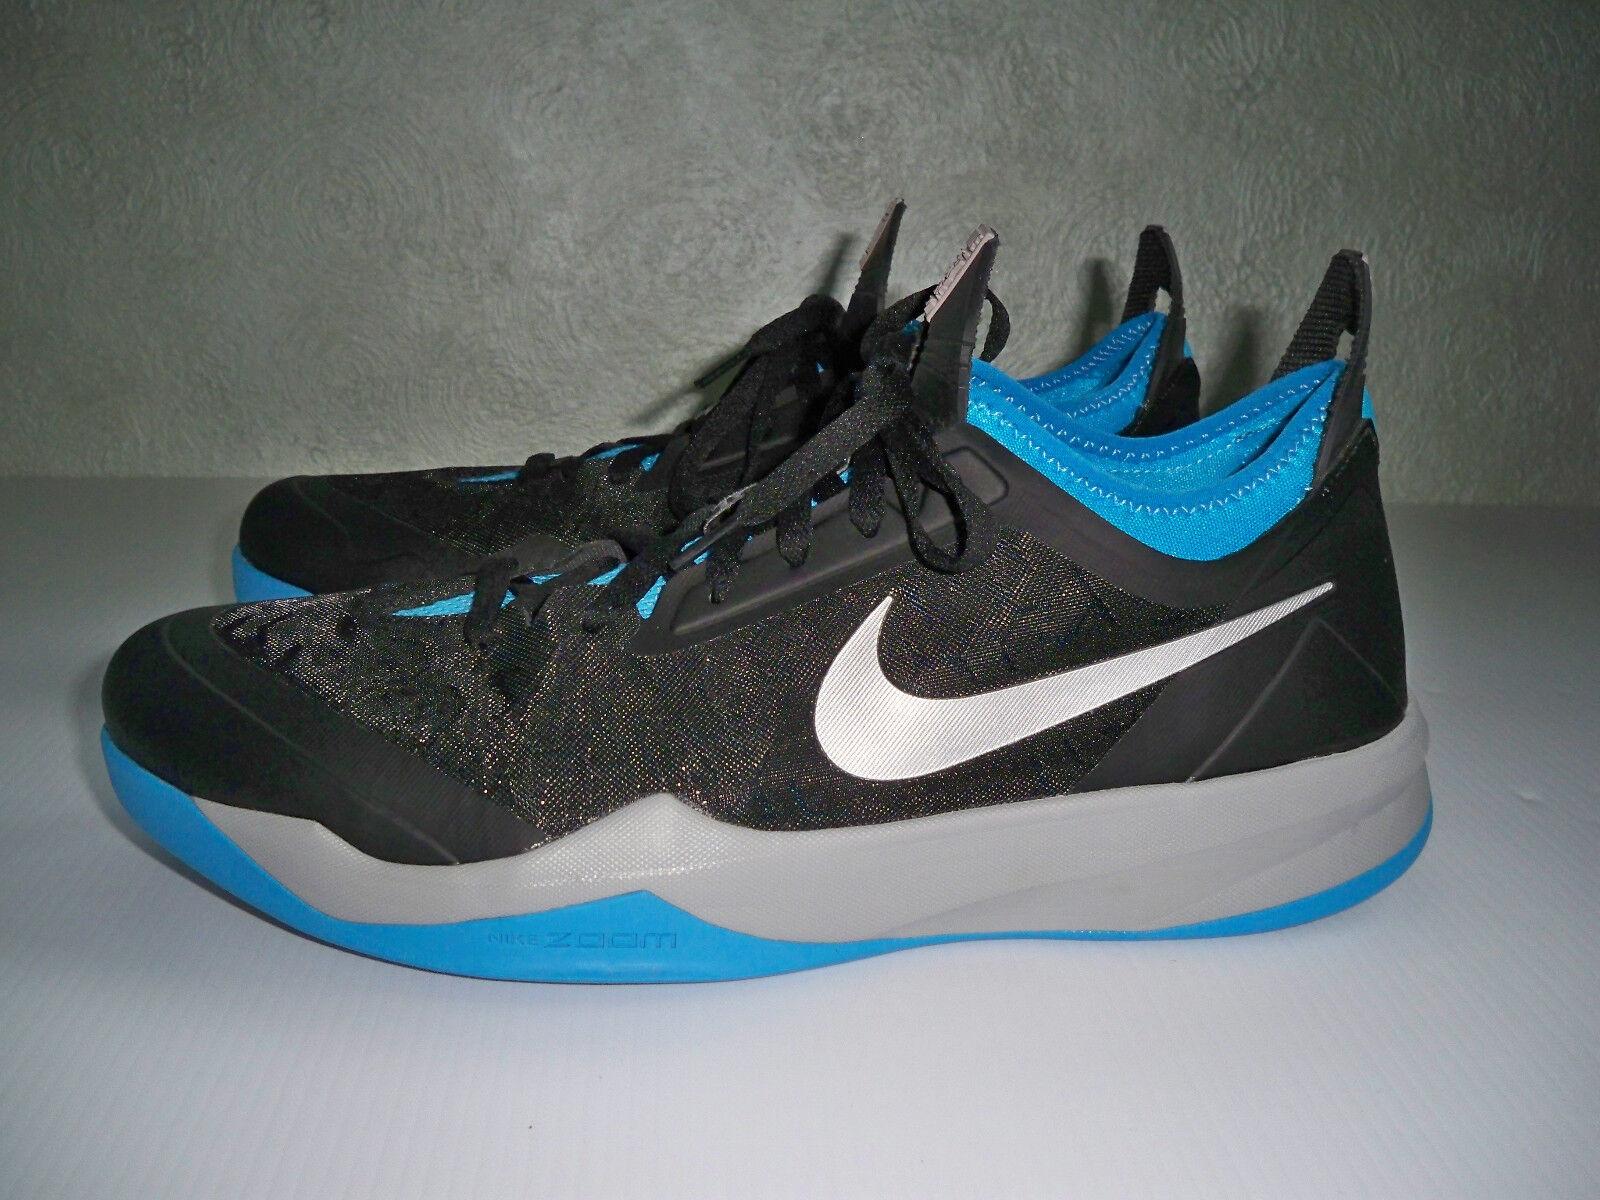 Nike Mens Mens Mens Zoom Crusader Low Basketball shoes 630909-002 SZ 14 Black bluee MINT 549eba